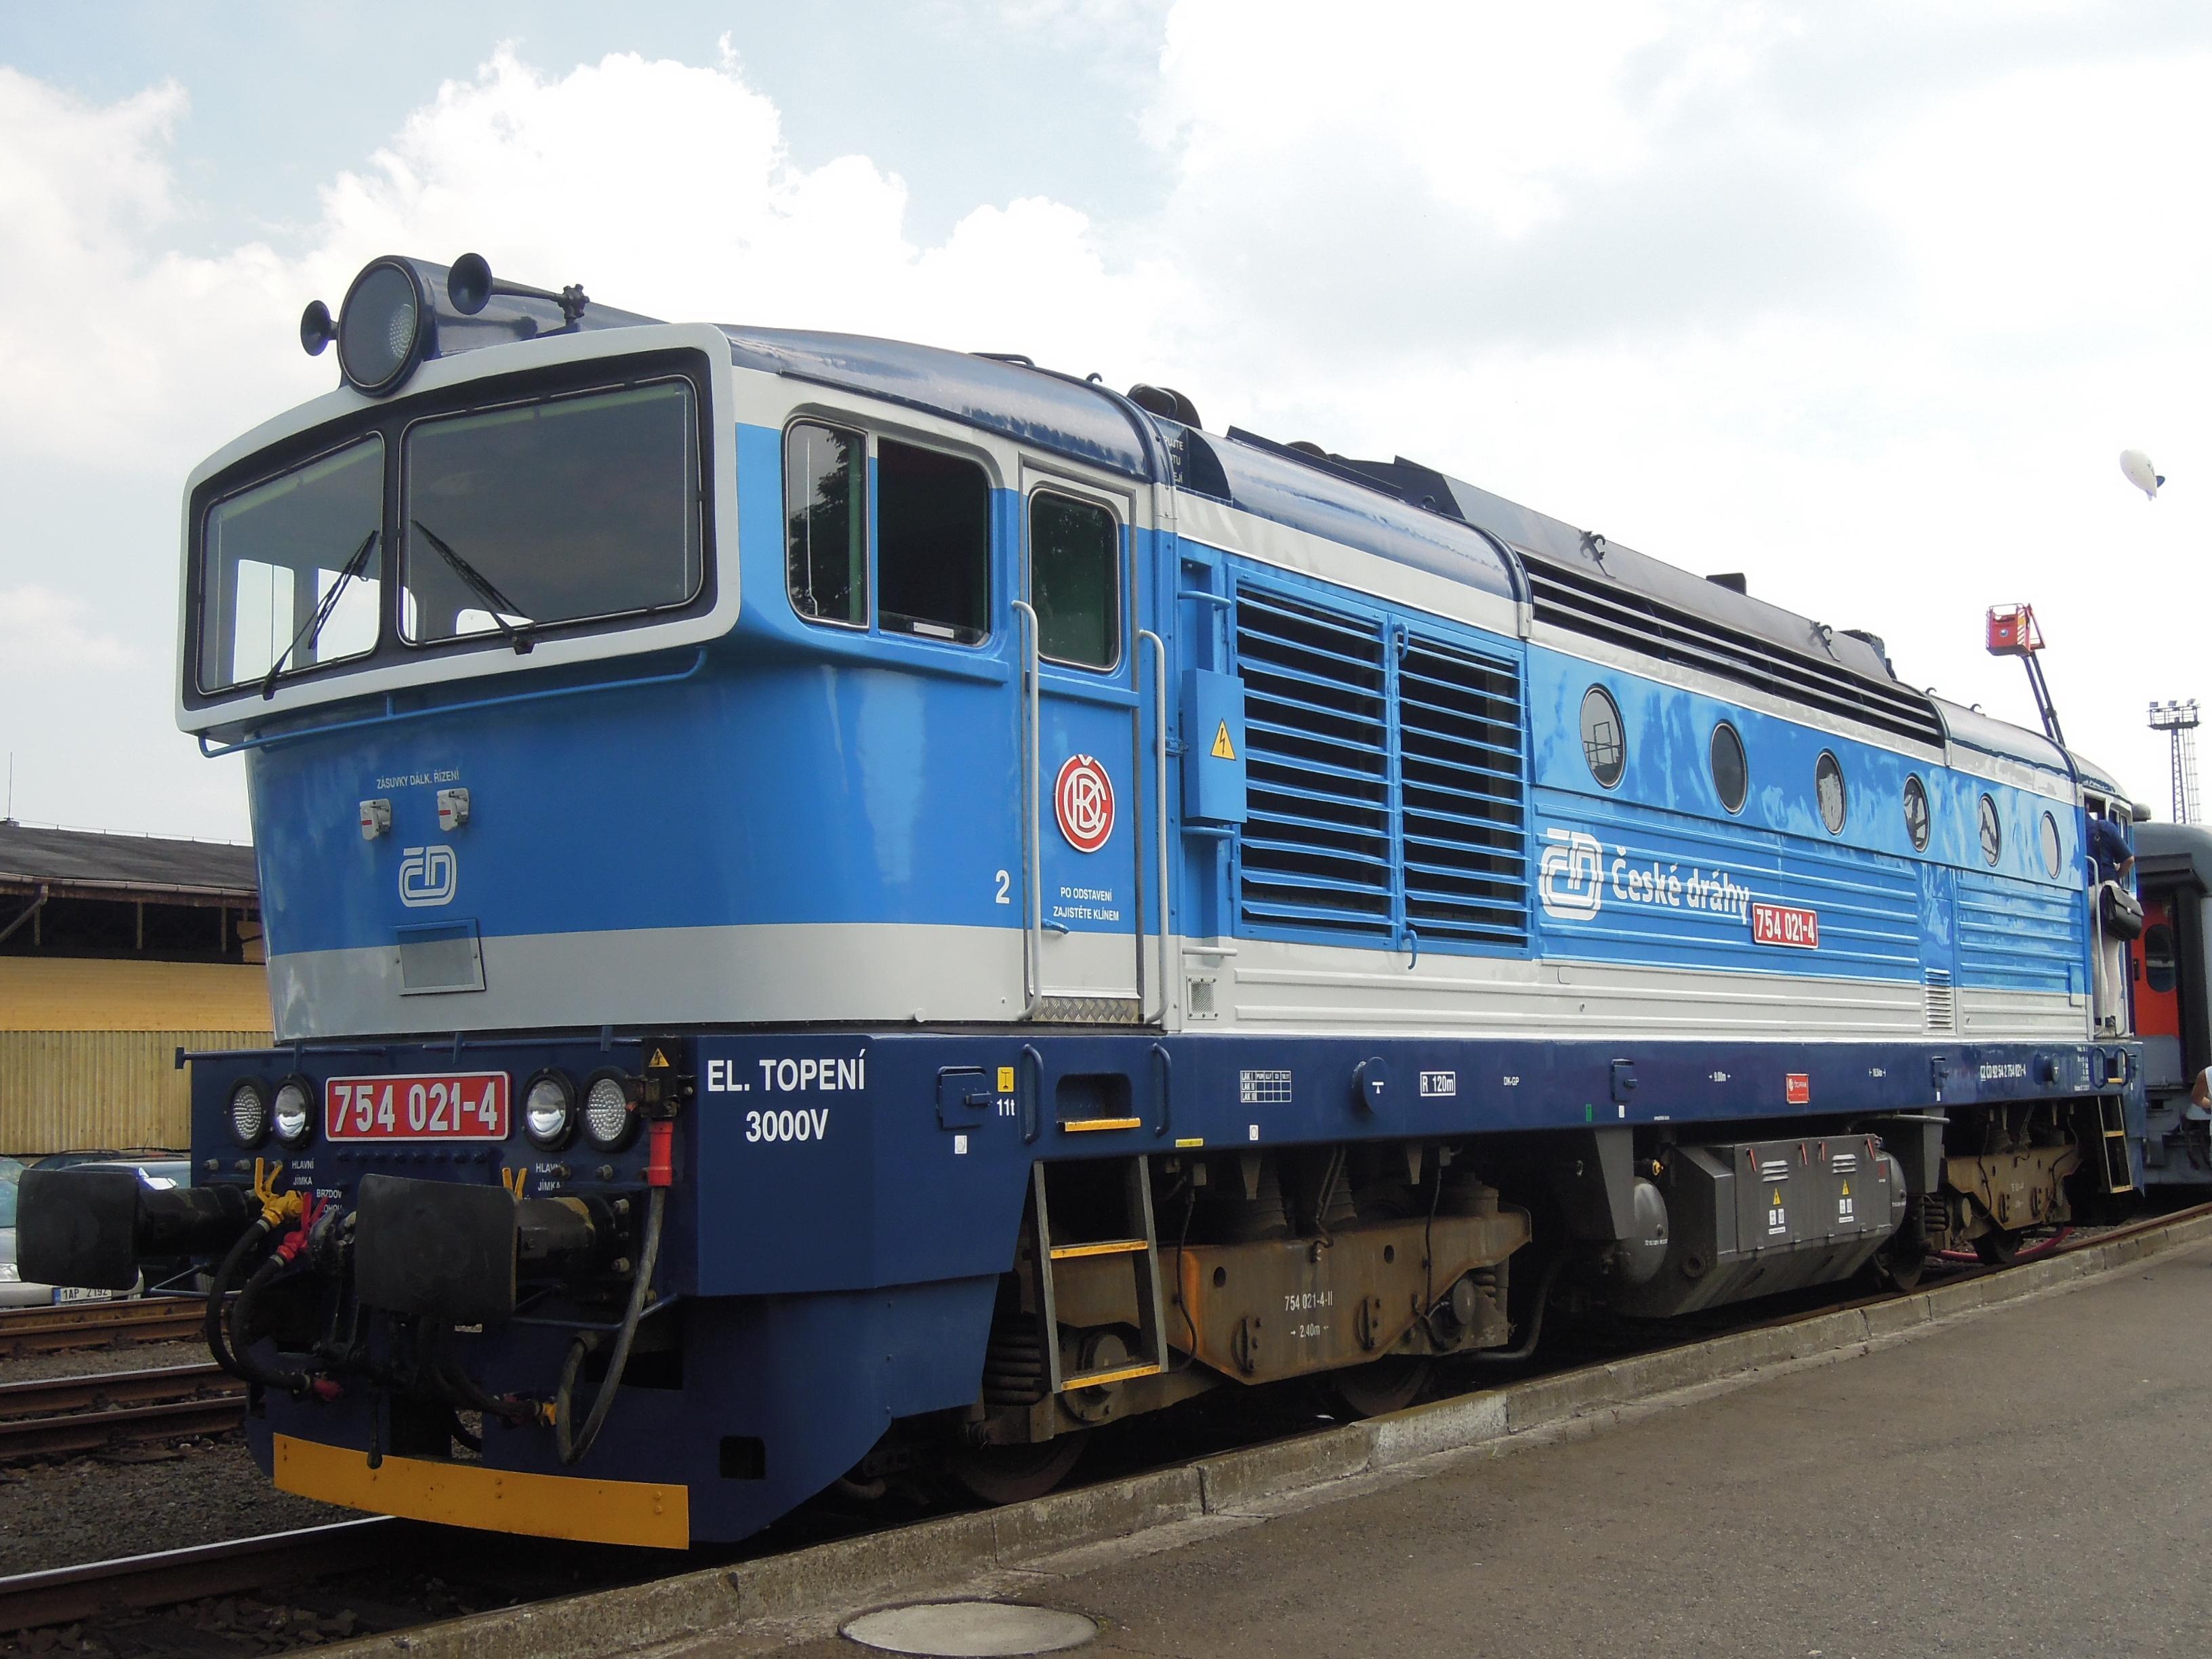 File:Czech Raildays 2012, ČD 754, 754 021-4 (02)